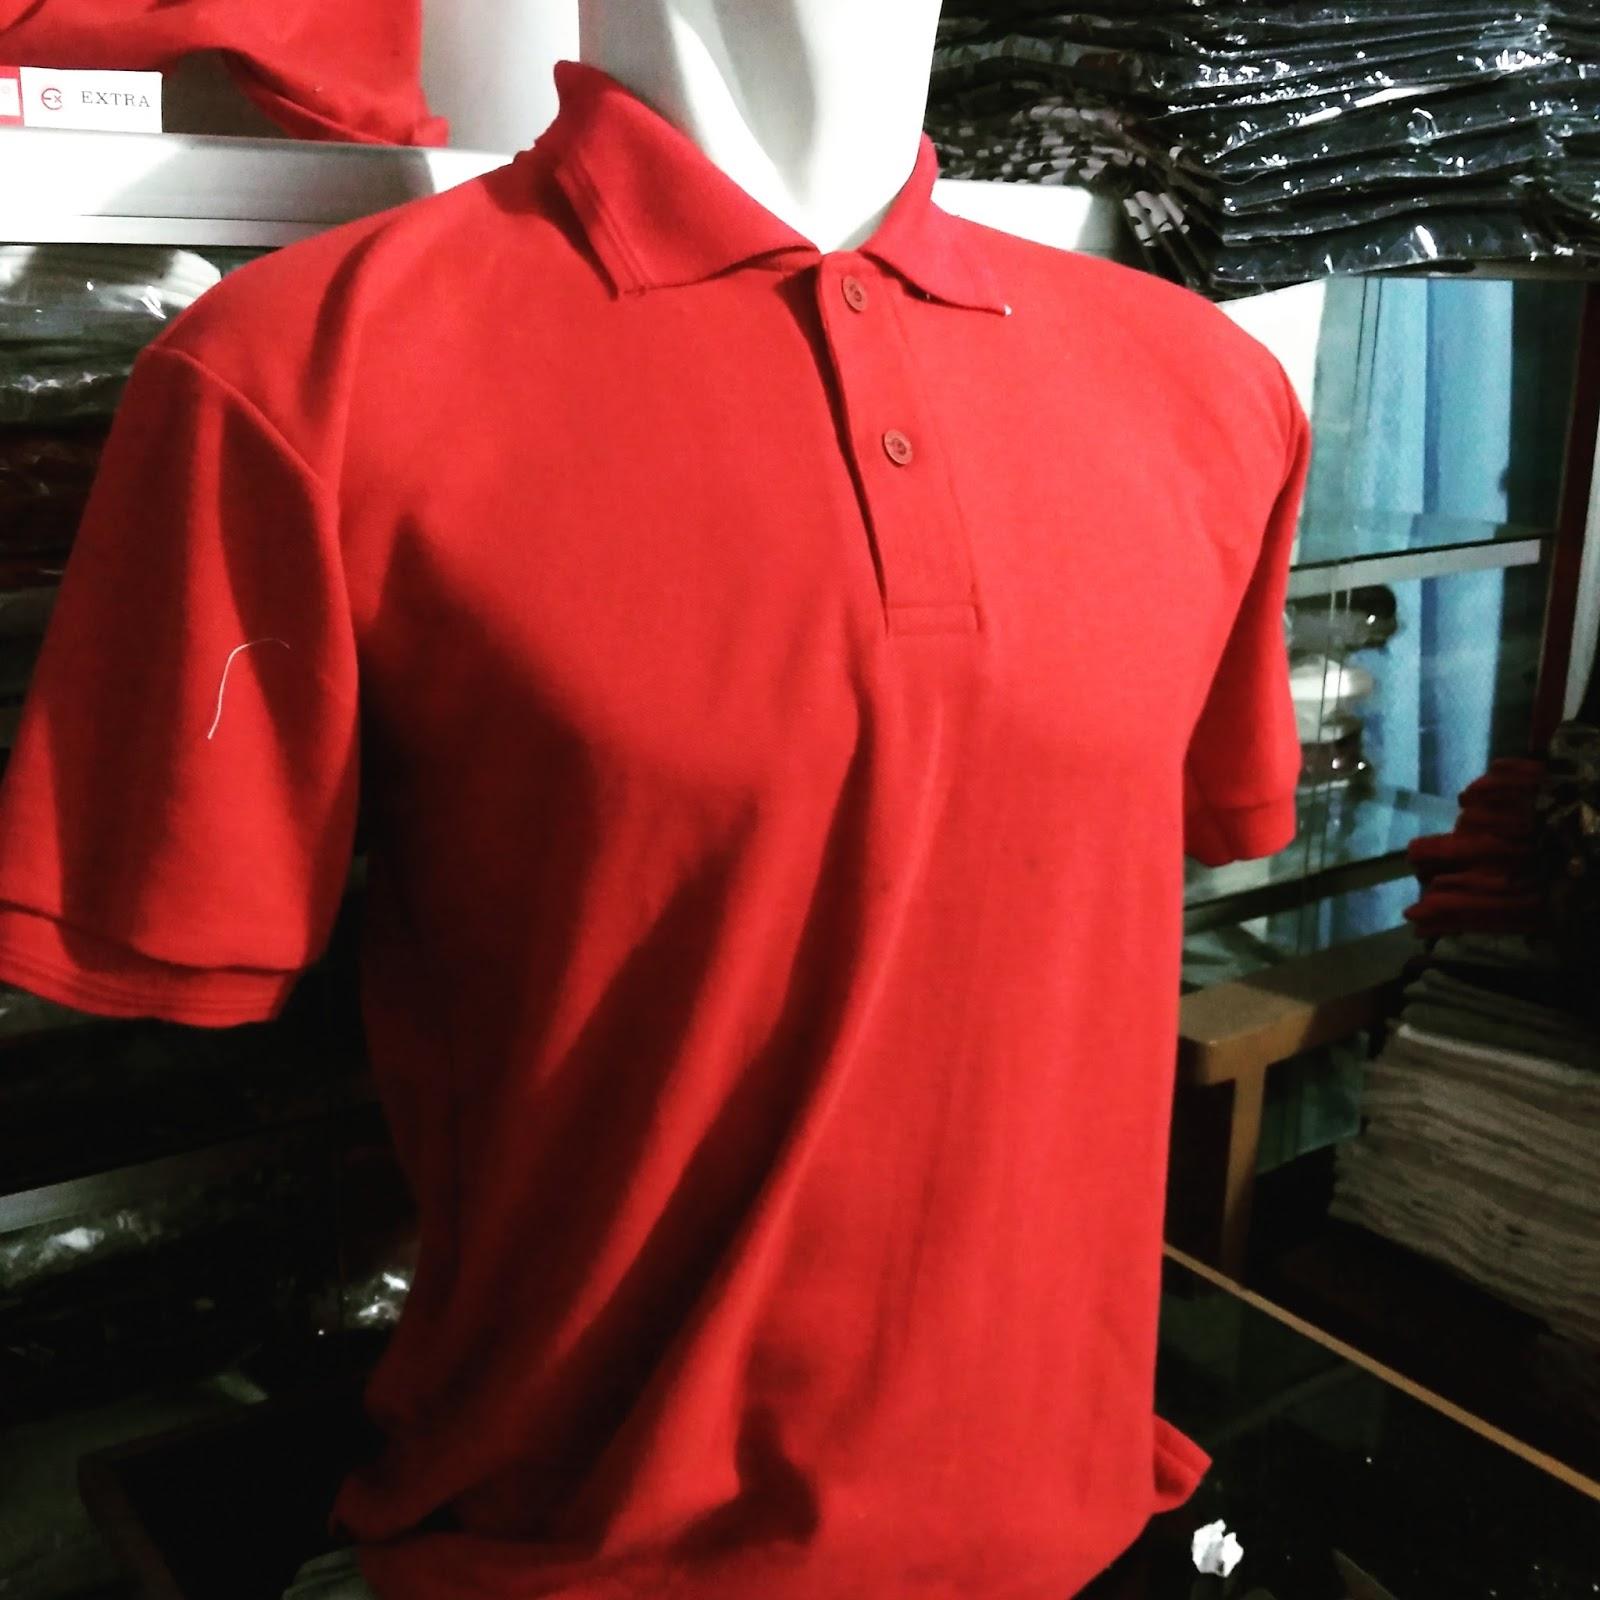 Kaos Polos Coklat Cotton Combed 30s Sudah Mendapatkan Berbahan Lengan Pendek Sedangkan Panjang Rp45000 Pcs Kalo Lusinan Lebih Murahbisa Cincailah